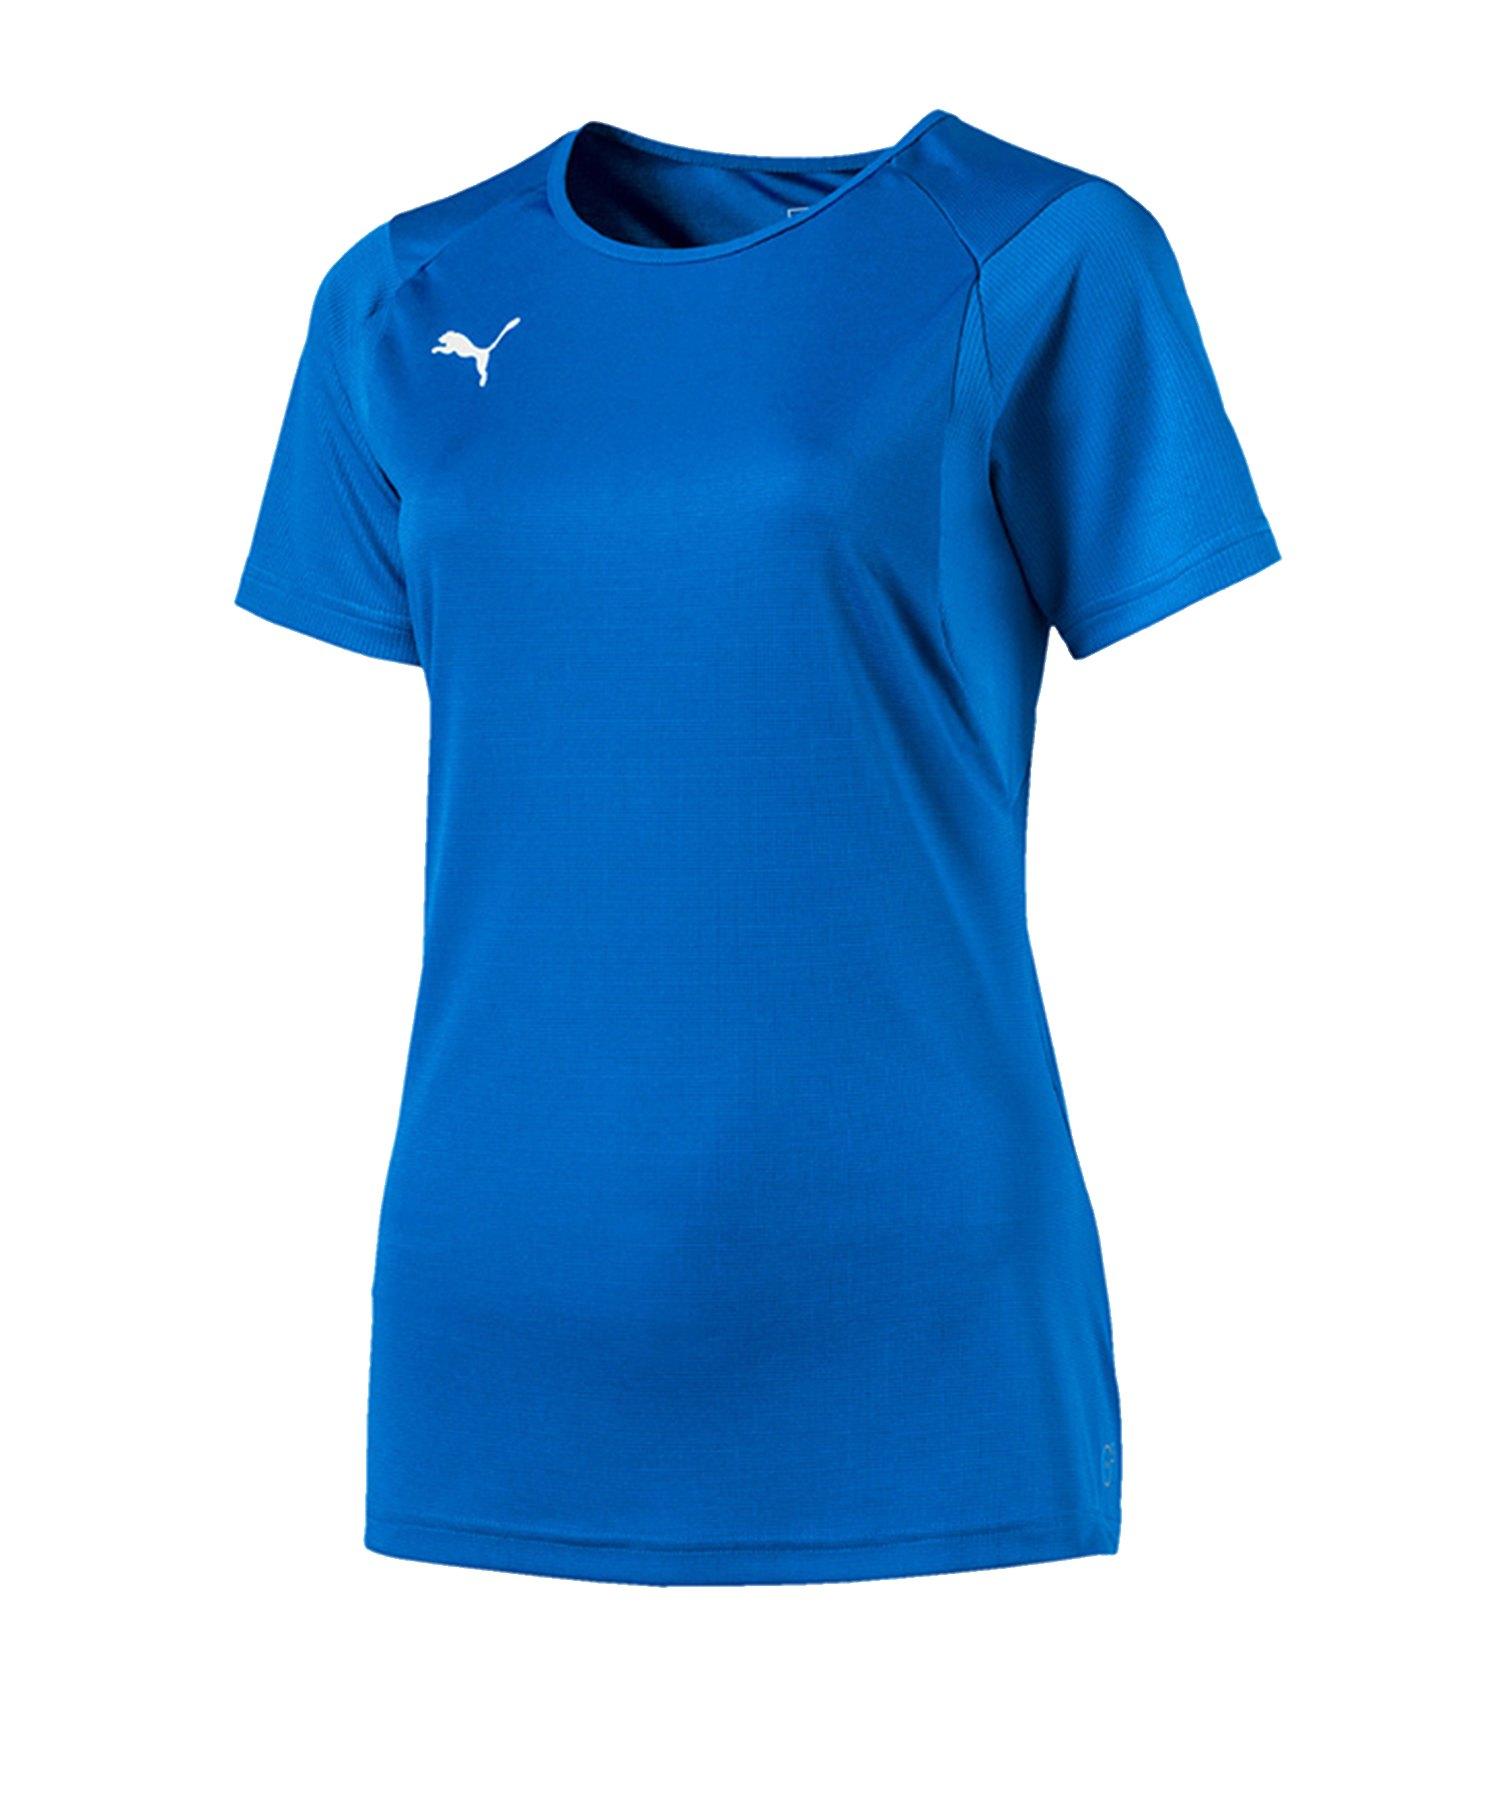 PUMA LIGA Training T-Shirt Damen Blau F02 - blau